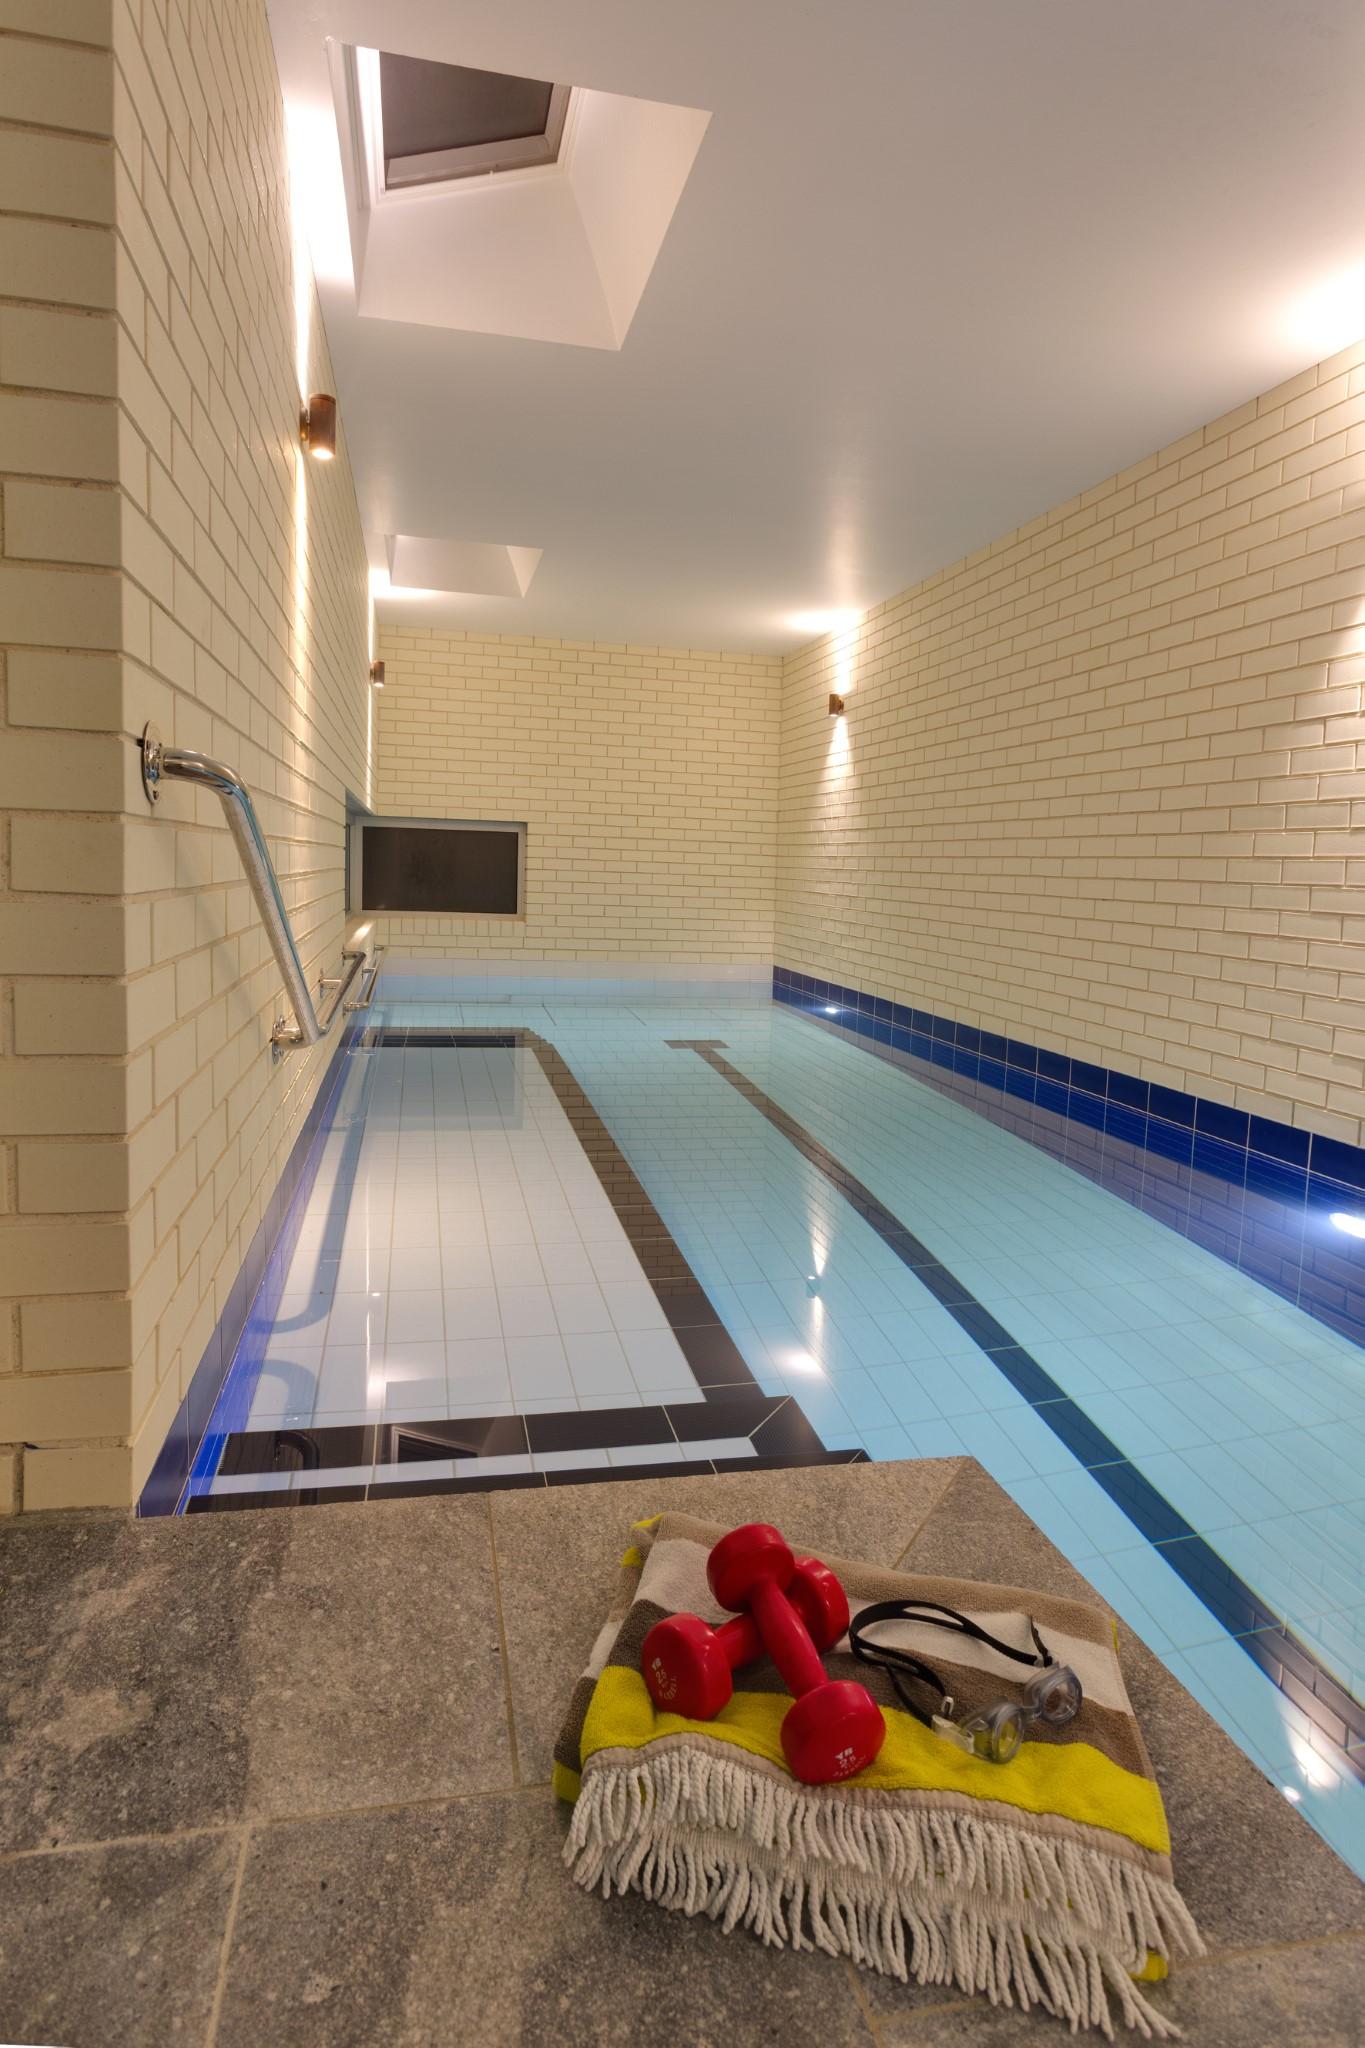 Inhouse Fitness Lap Pool